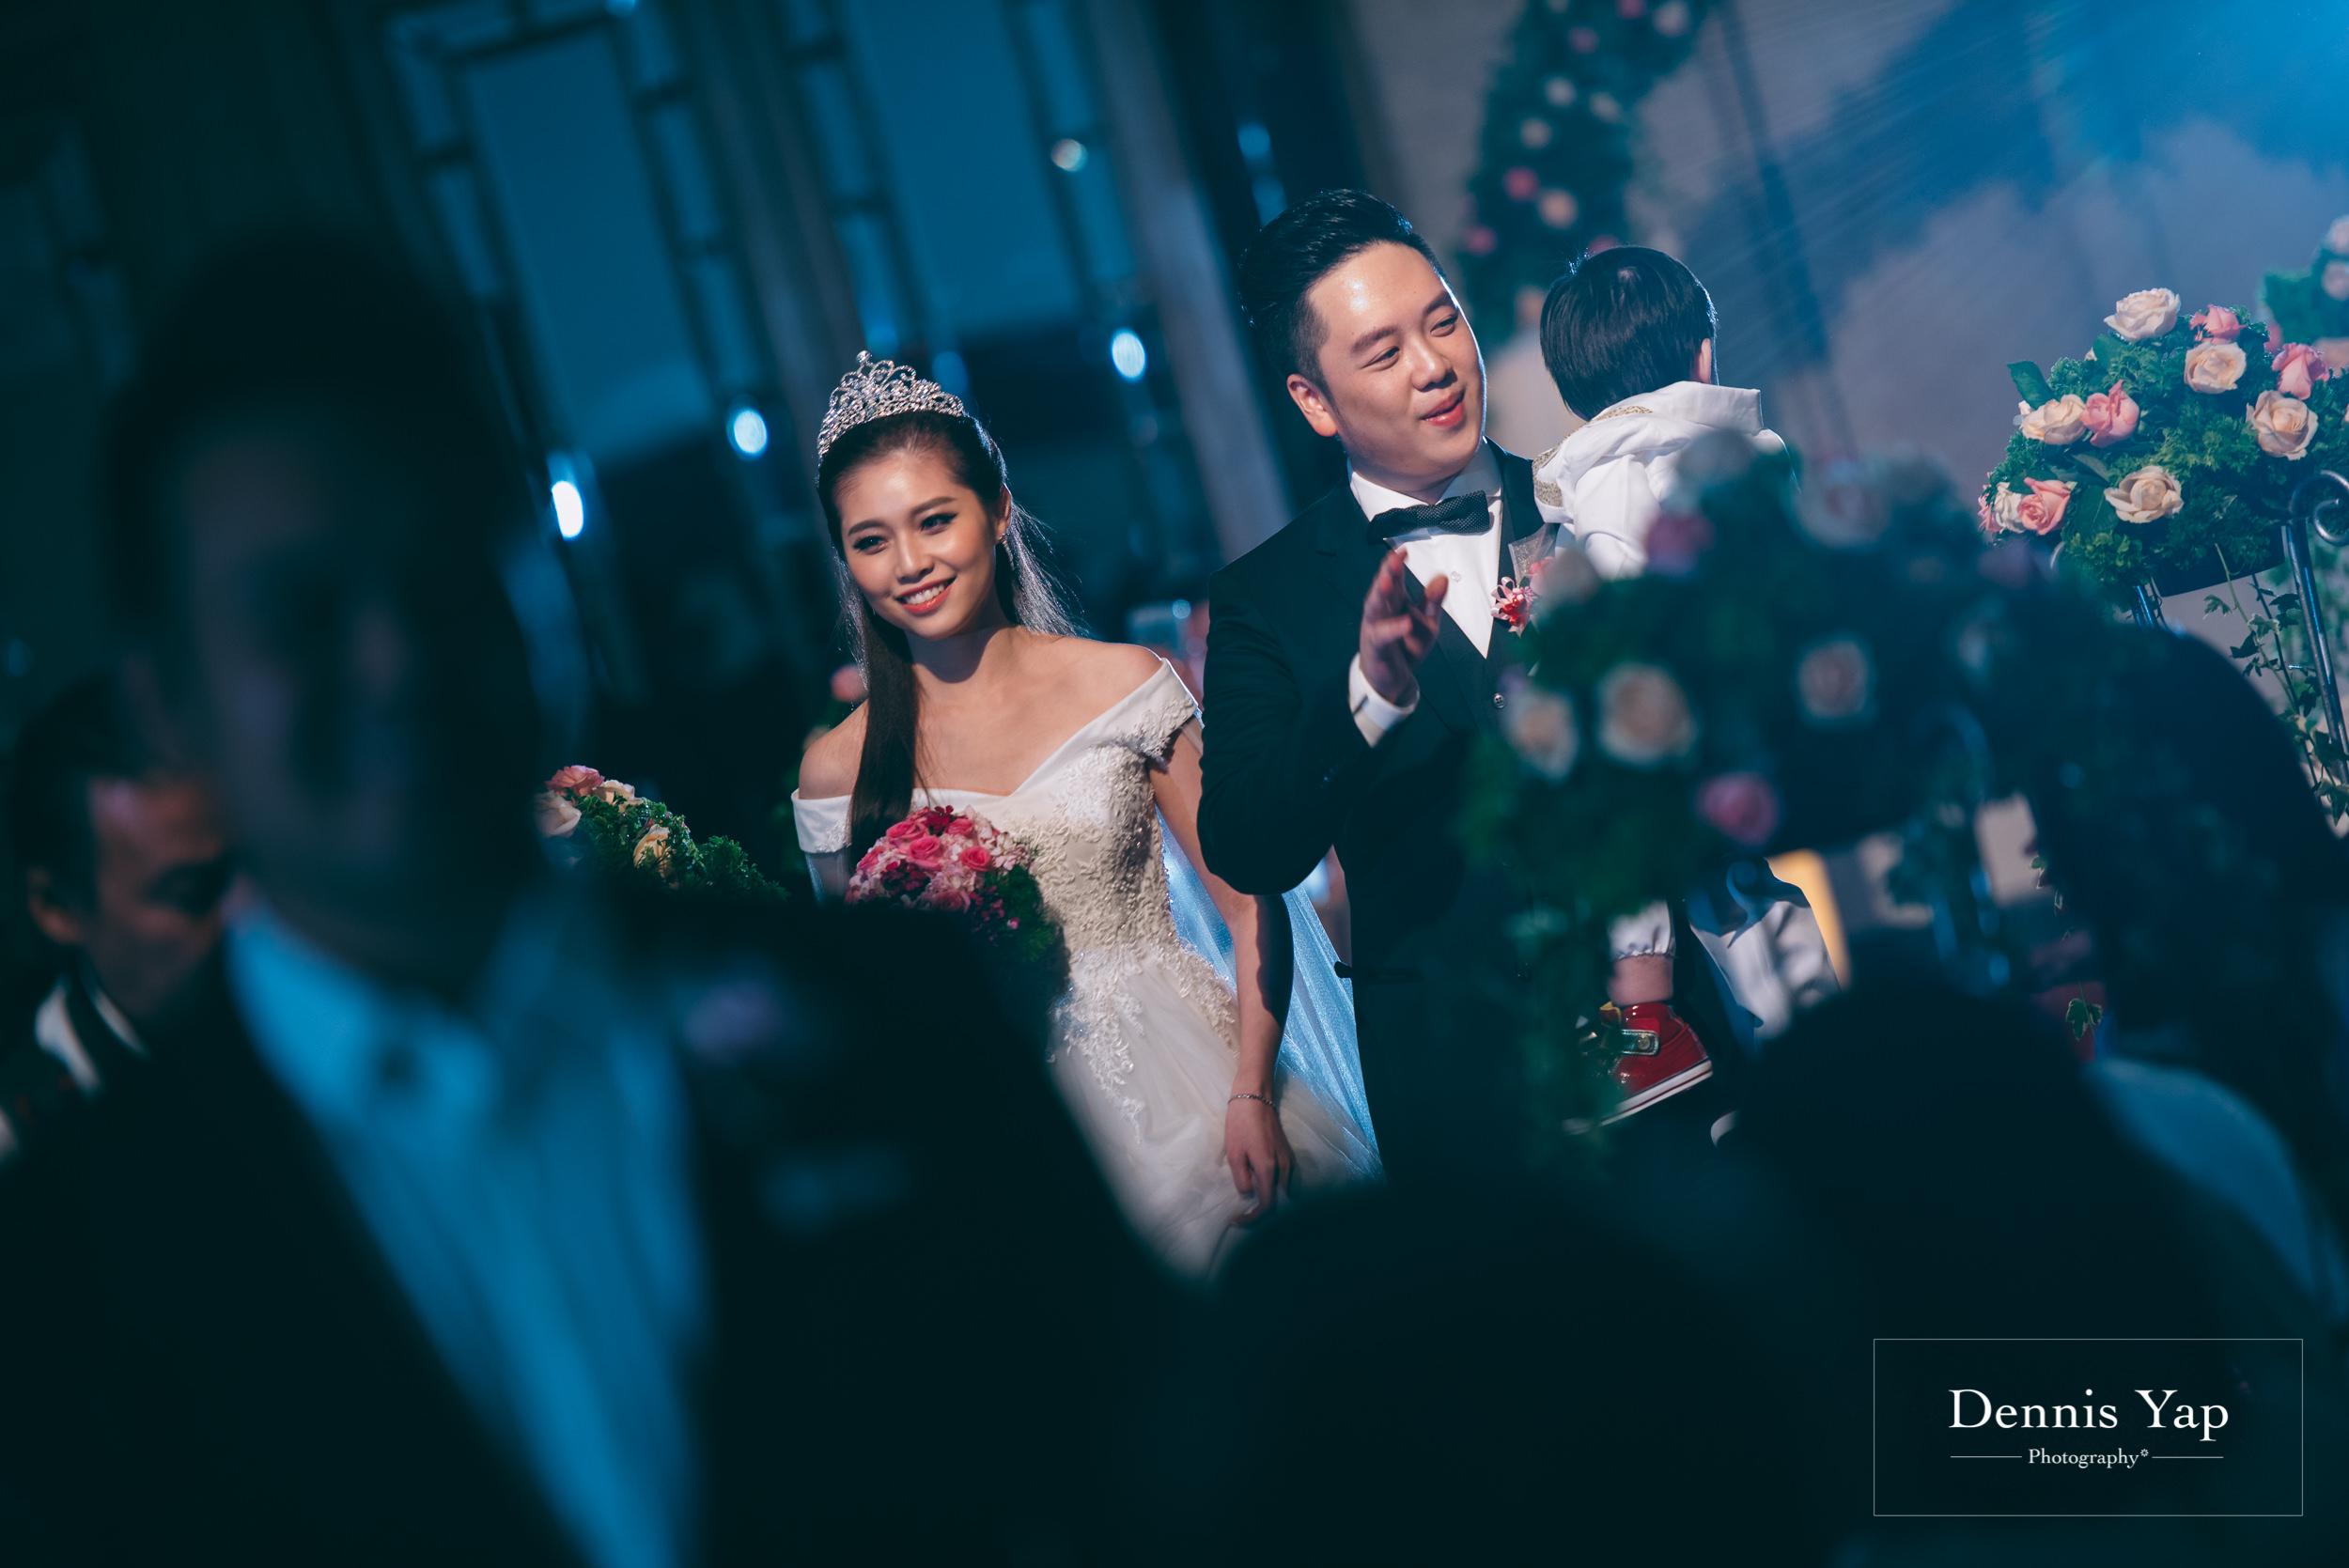 ivan constance wedding day renaissance hotel dennis yap photography-36.jpg